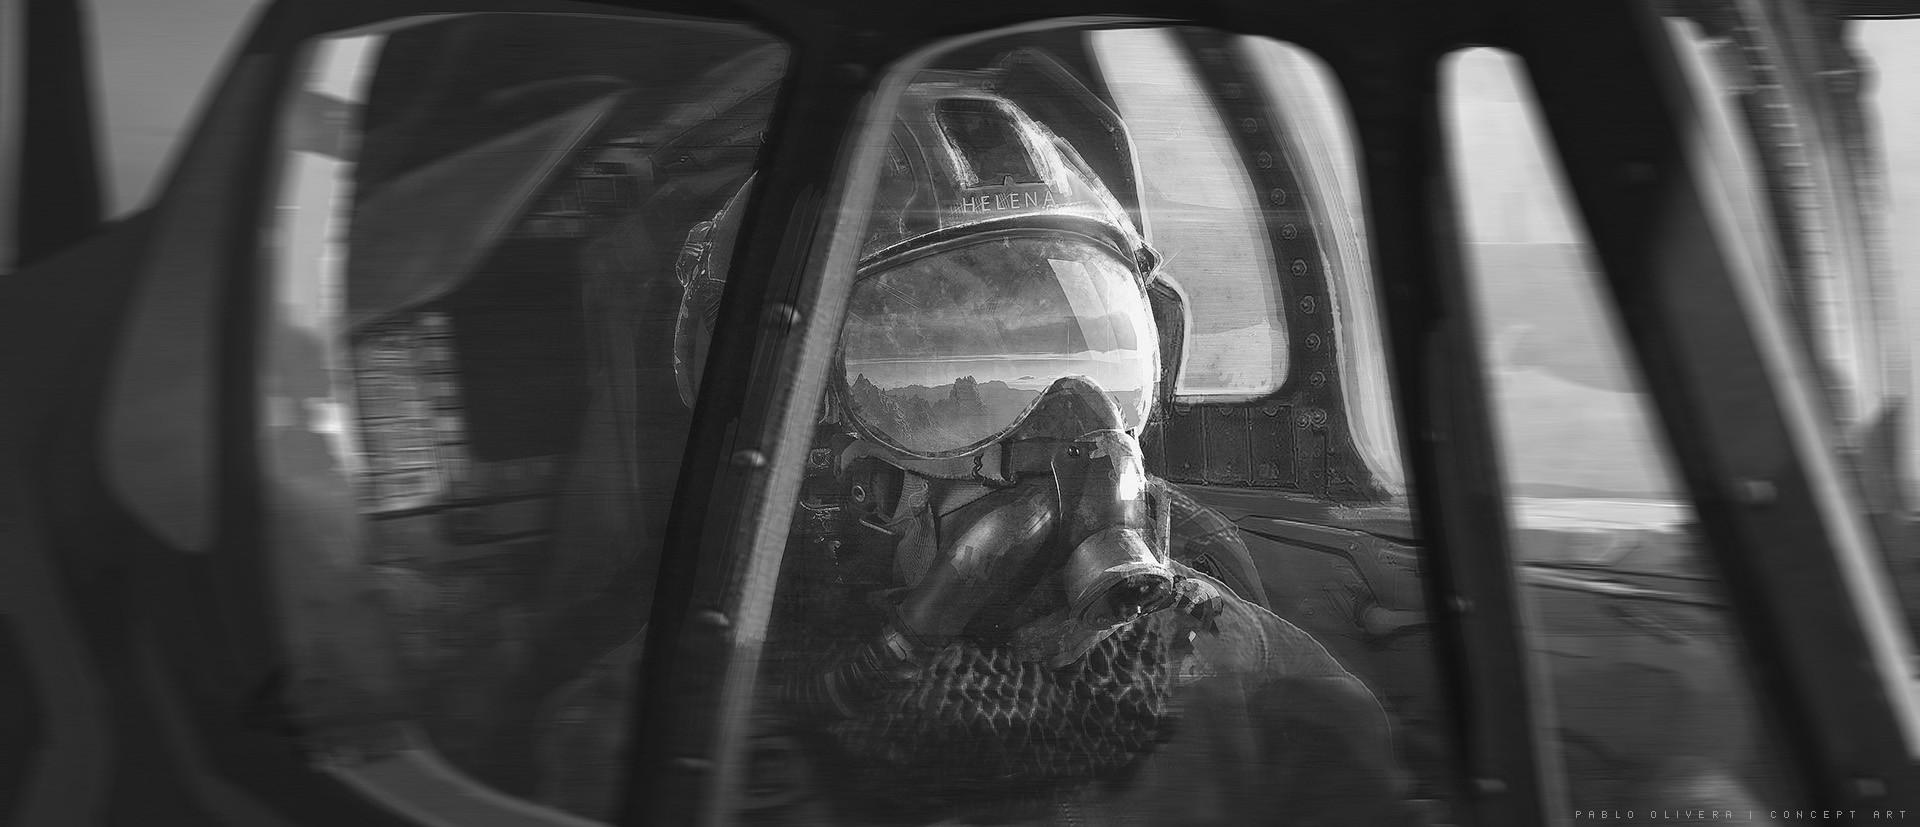 Pablo olivera helena pilot airplane concept art 06